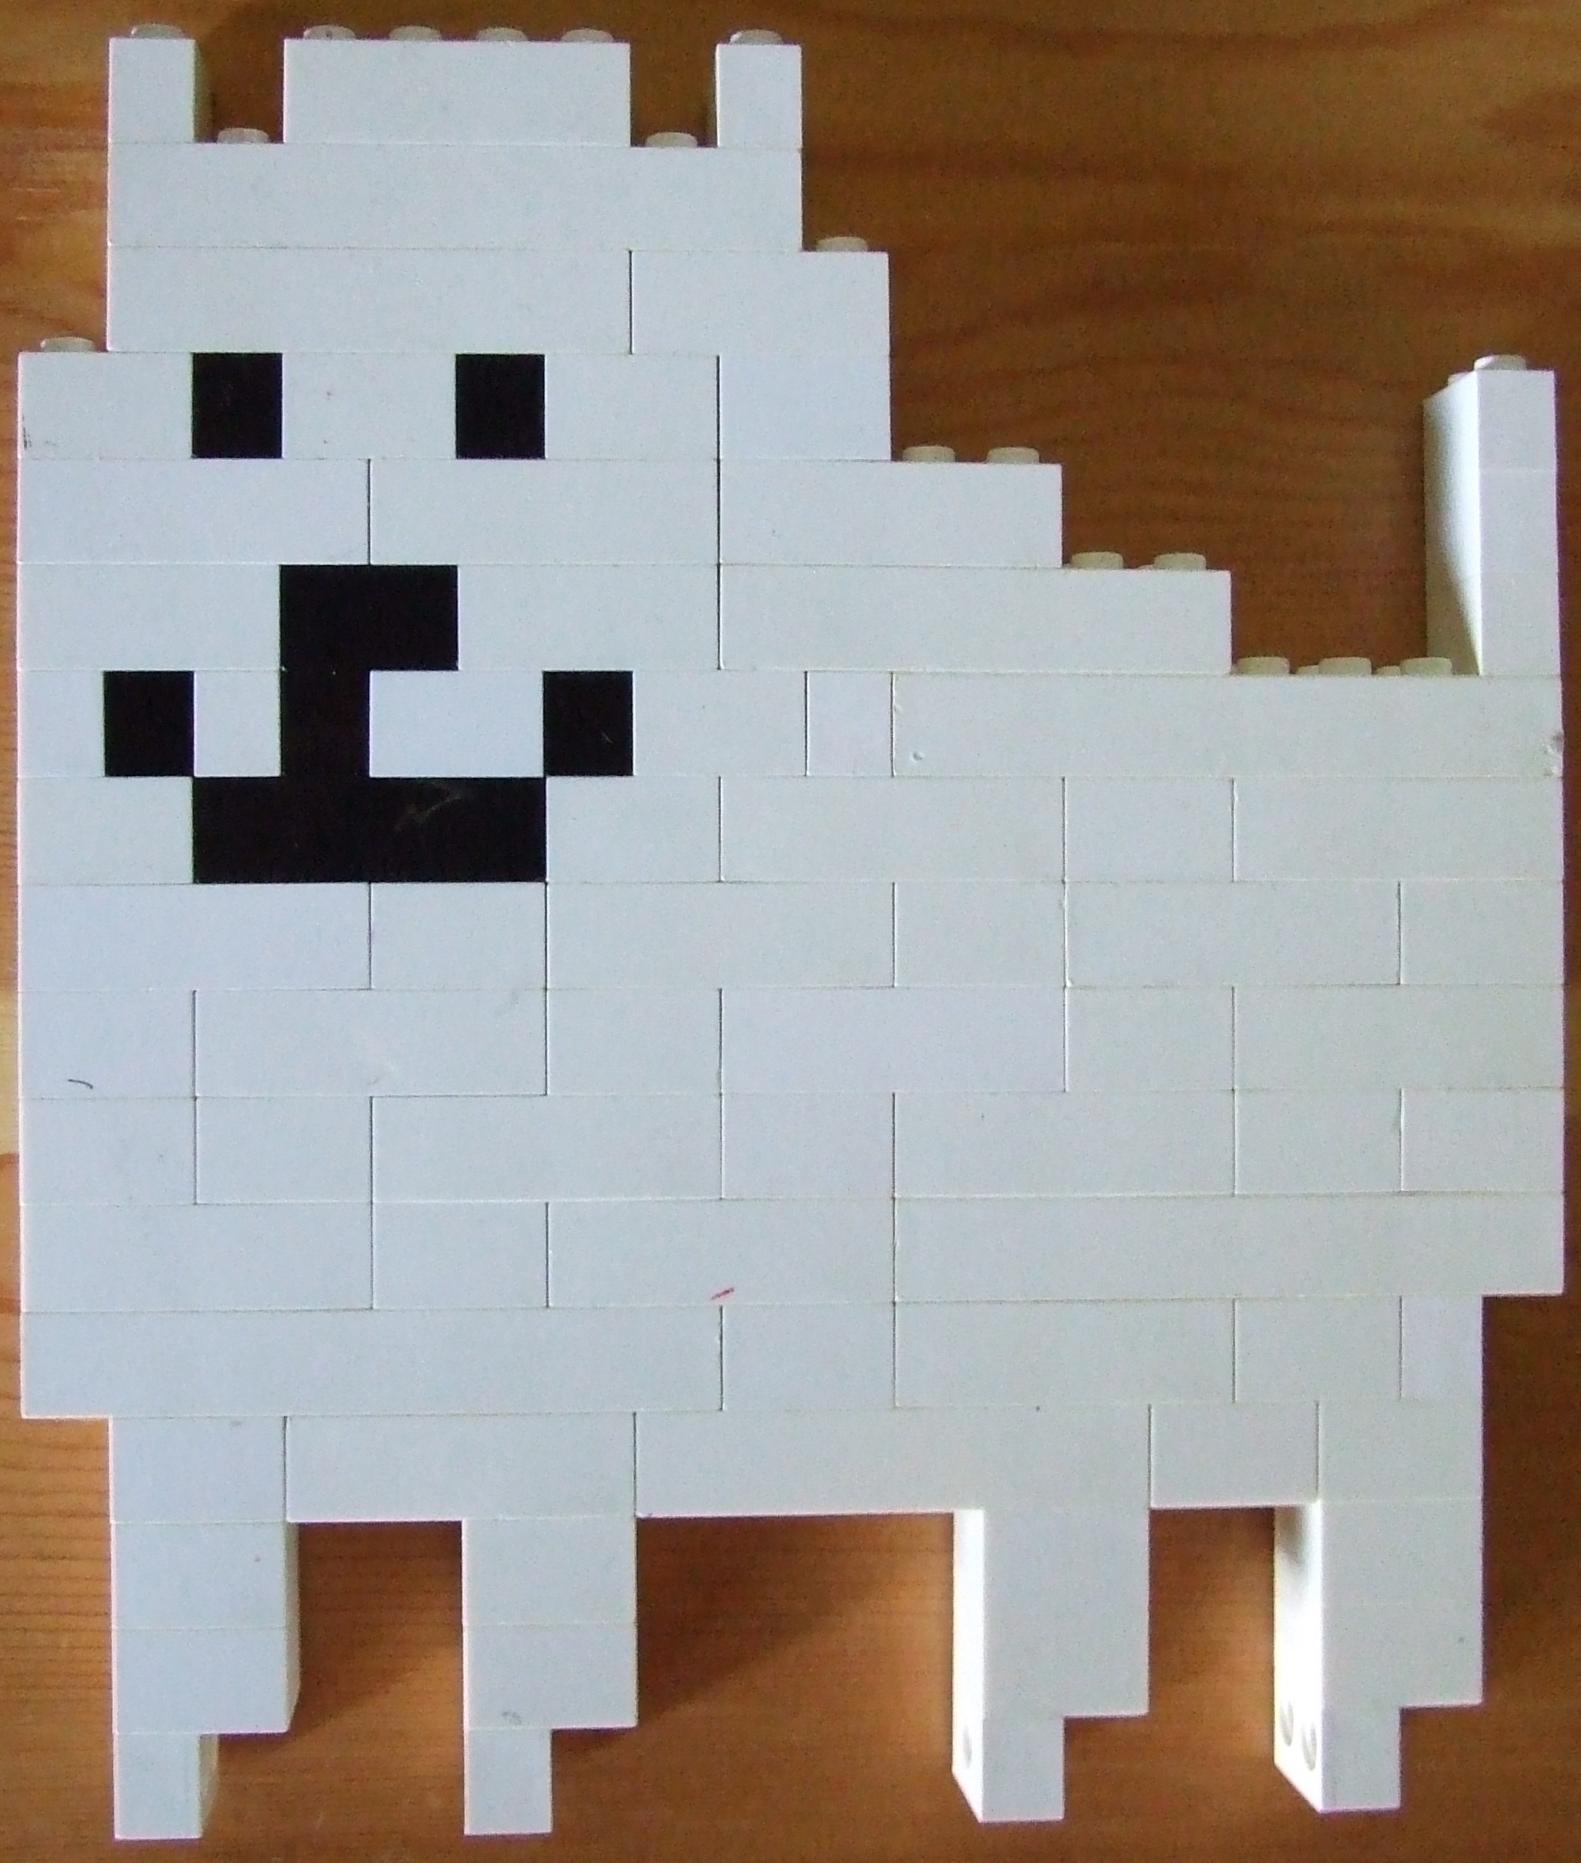 Annoying Dog Undertale Lego Pixel Art By Infinitefiregamer On Deviantart